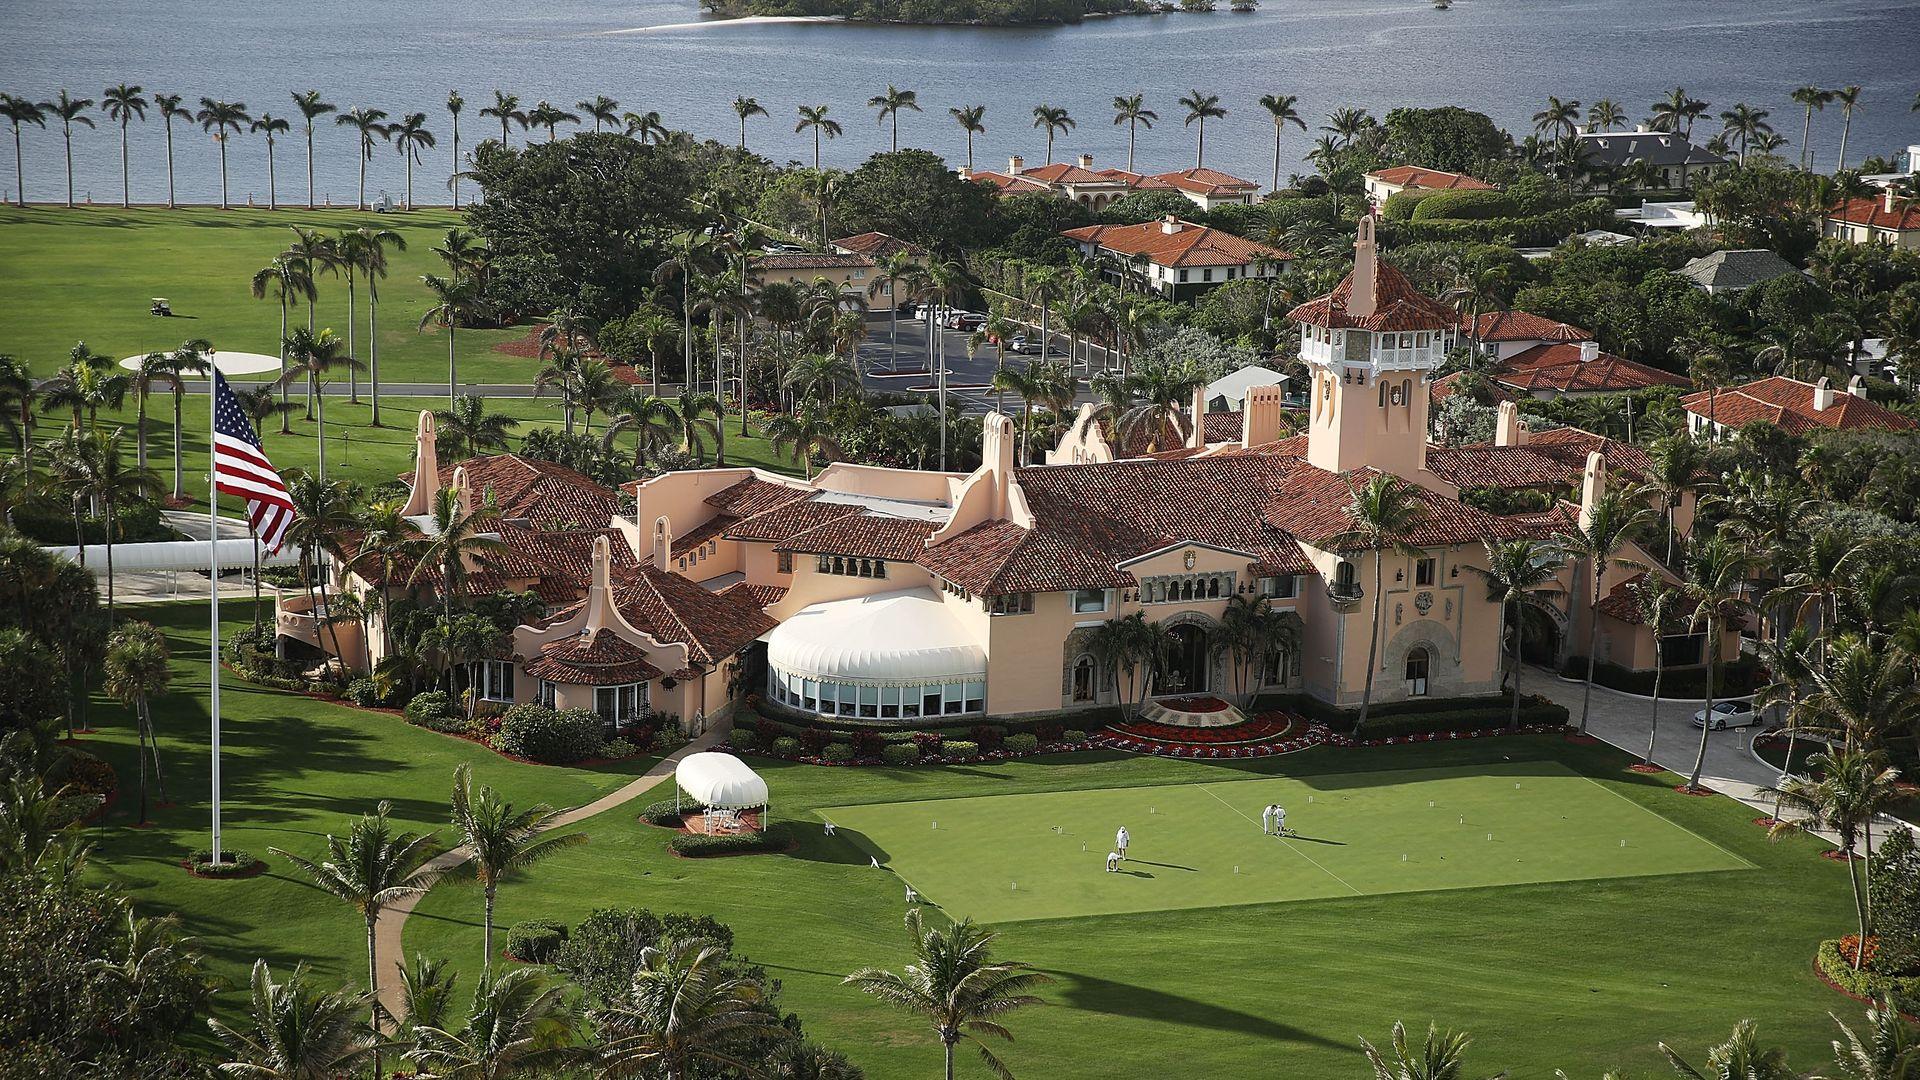 PresidentTrump's beach front Mar-a-Lago resort in Palm Beach, Florida. Photo: Joe Raedle/Getty Images